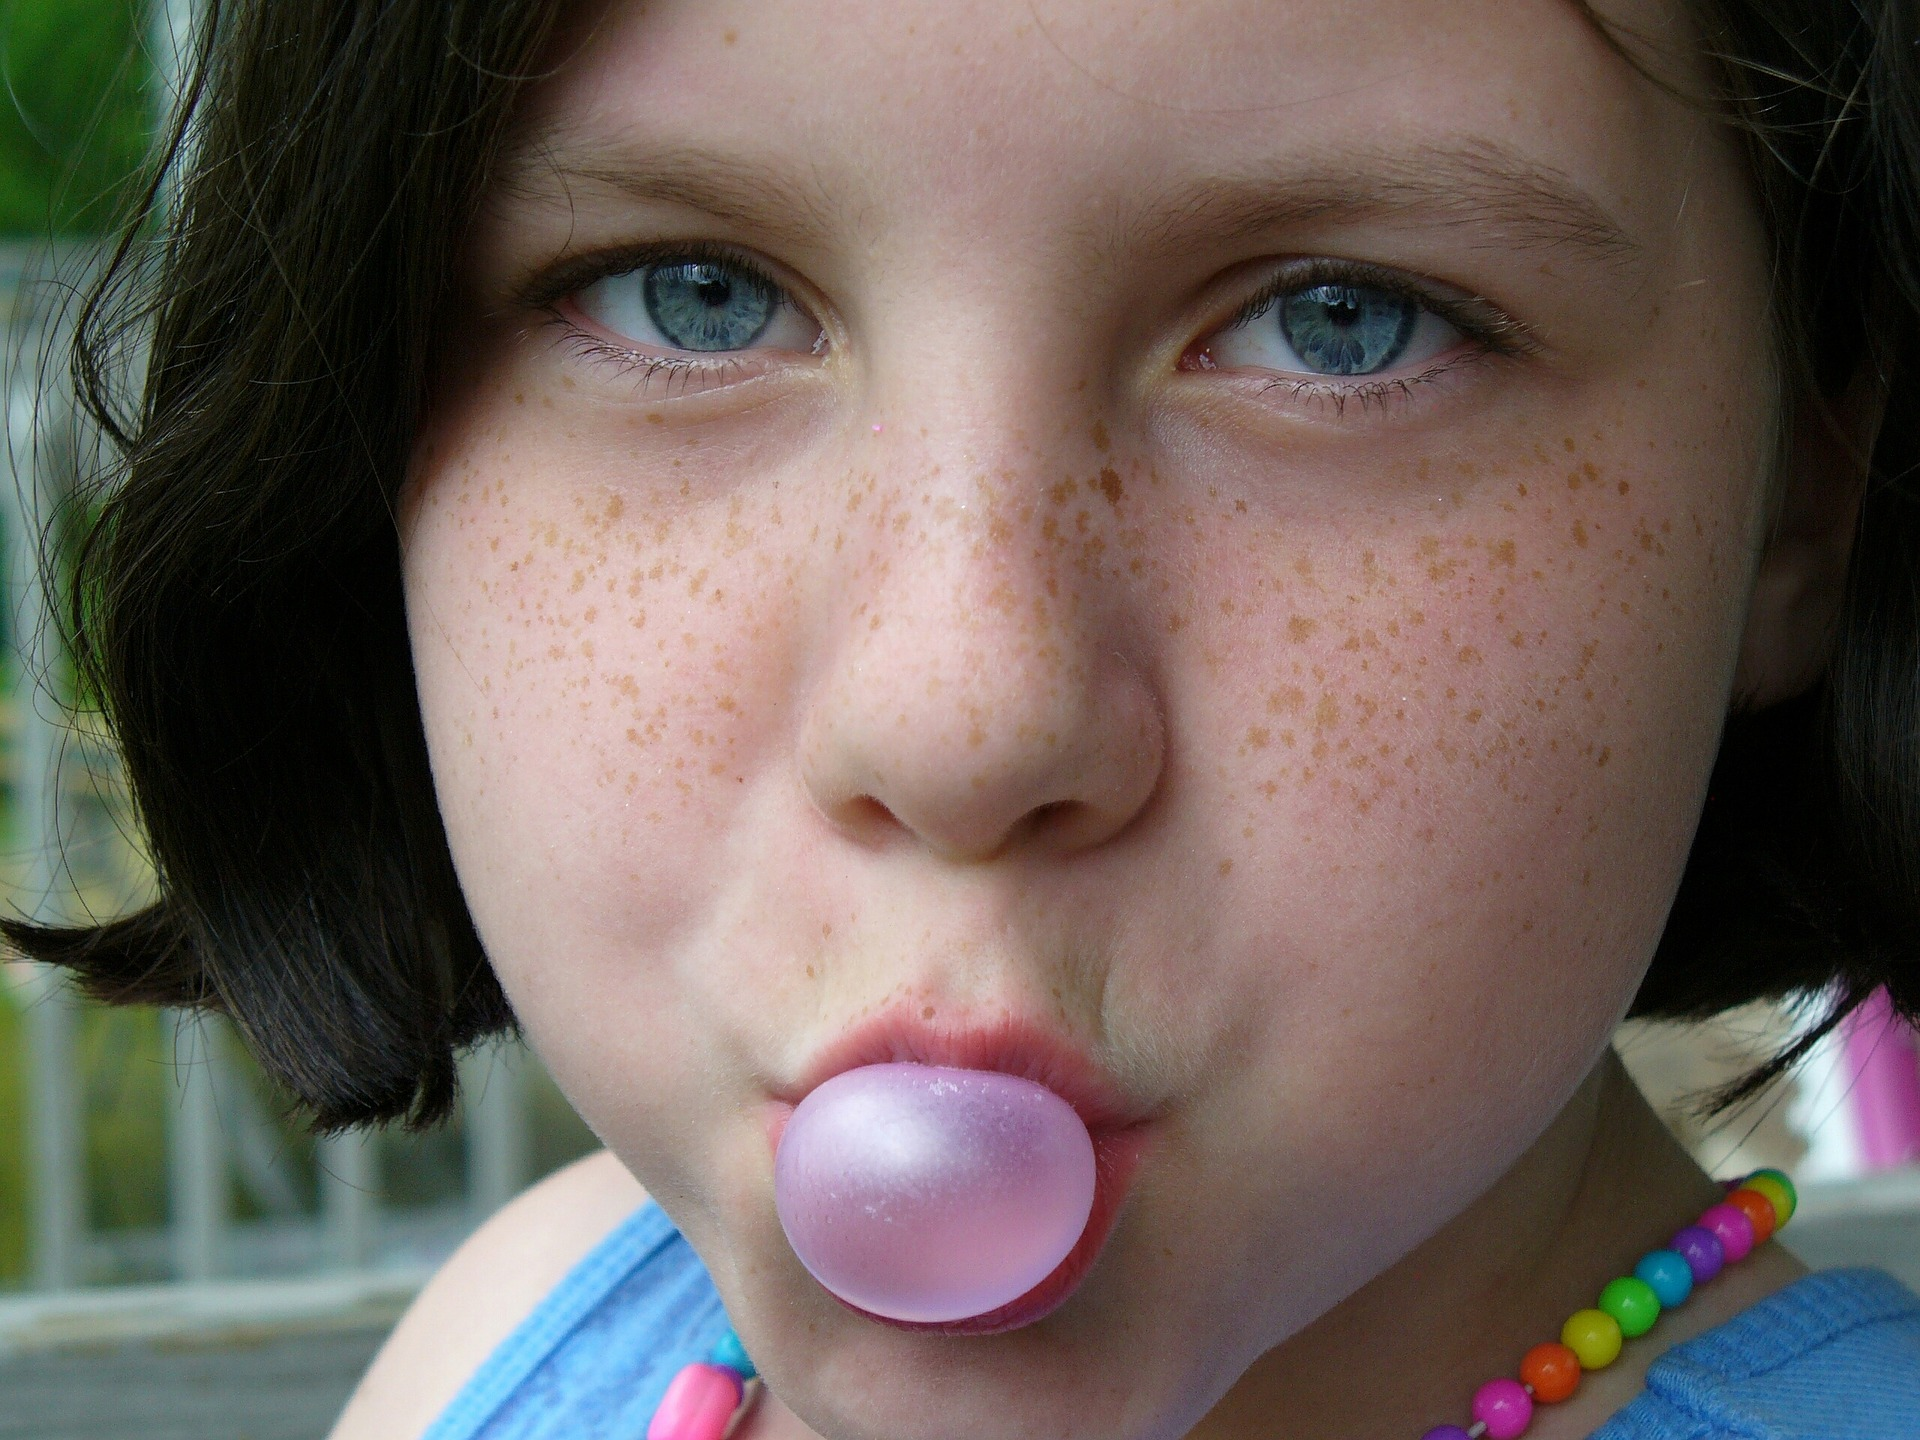 guma de mestecat in par - sfatulparintilor.ro - pixabay_com - girl-1101936_1920